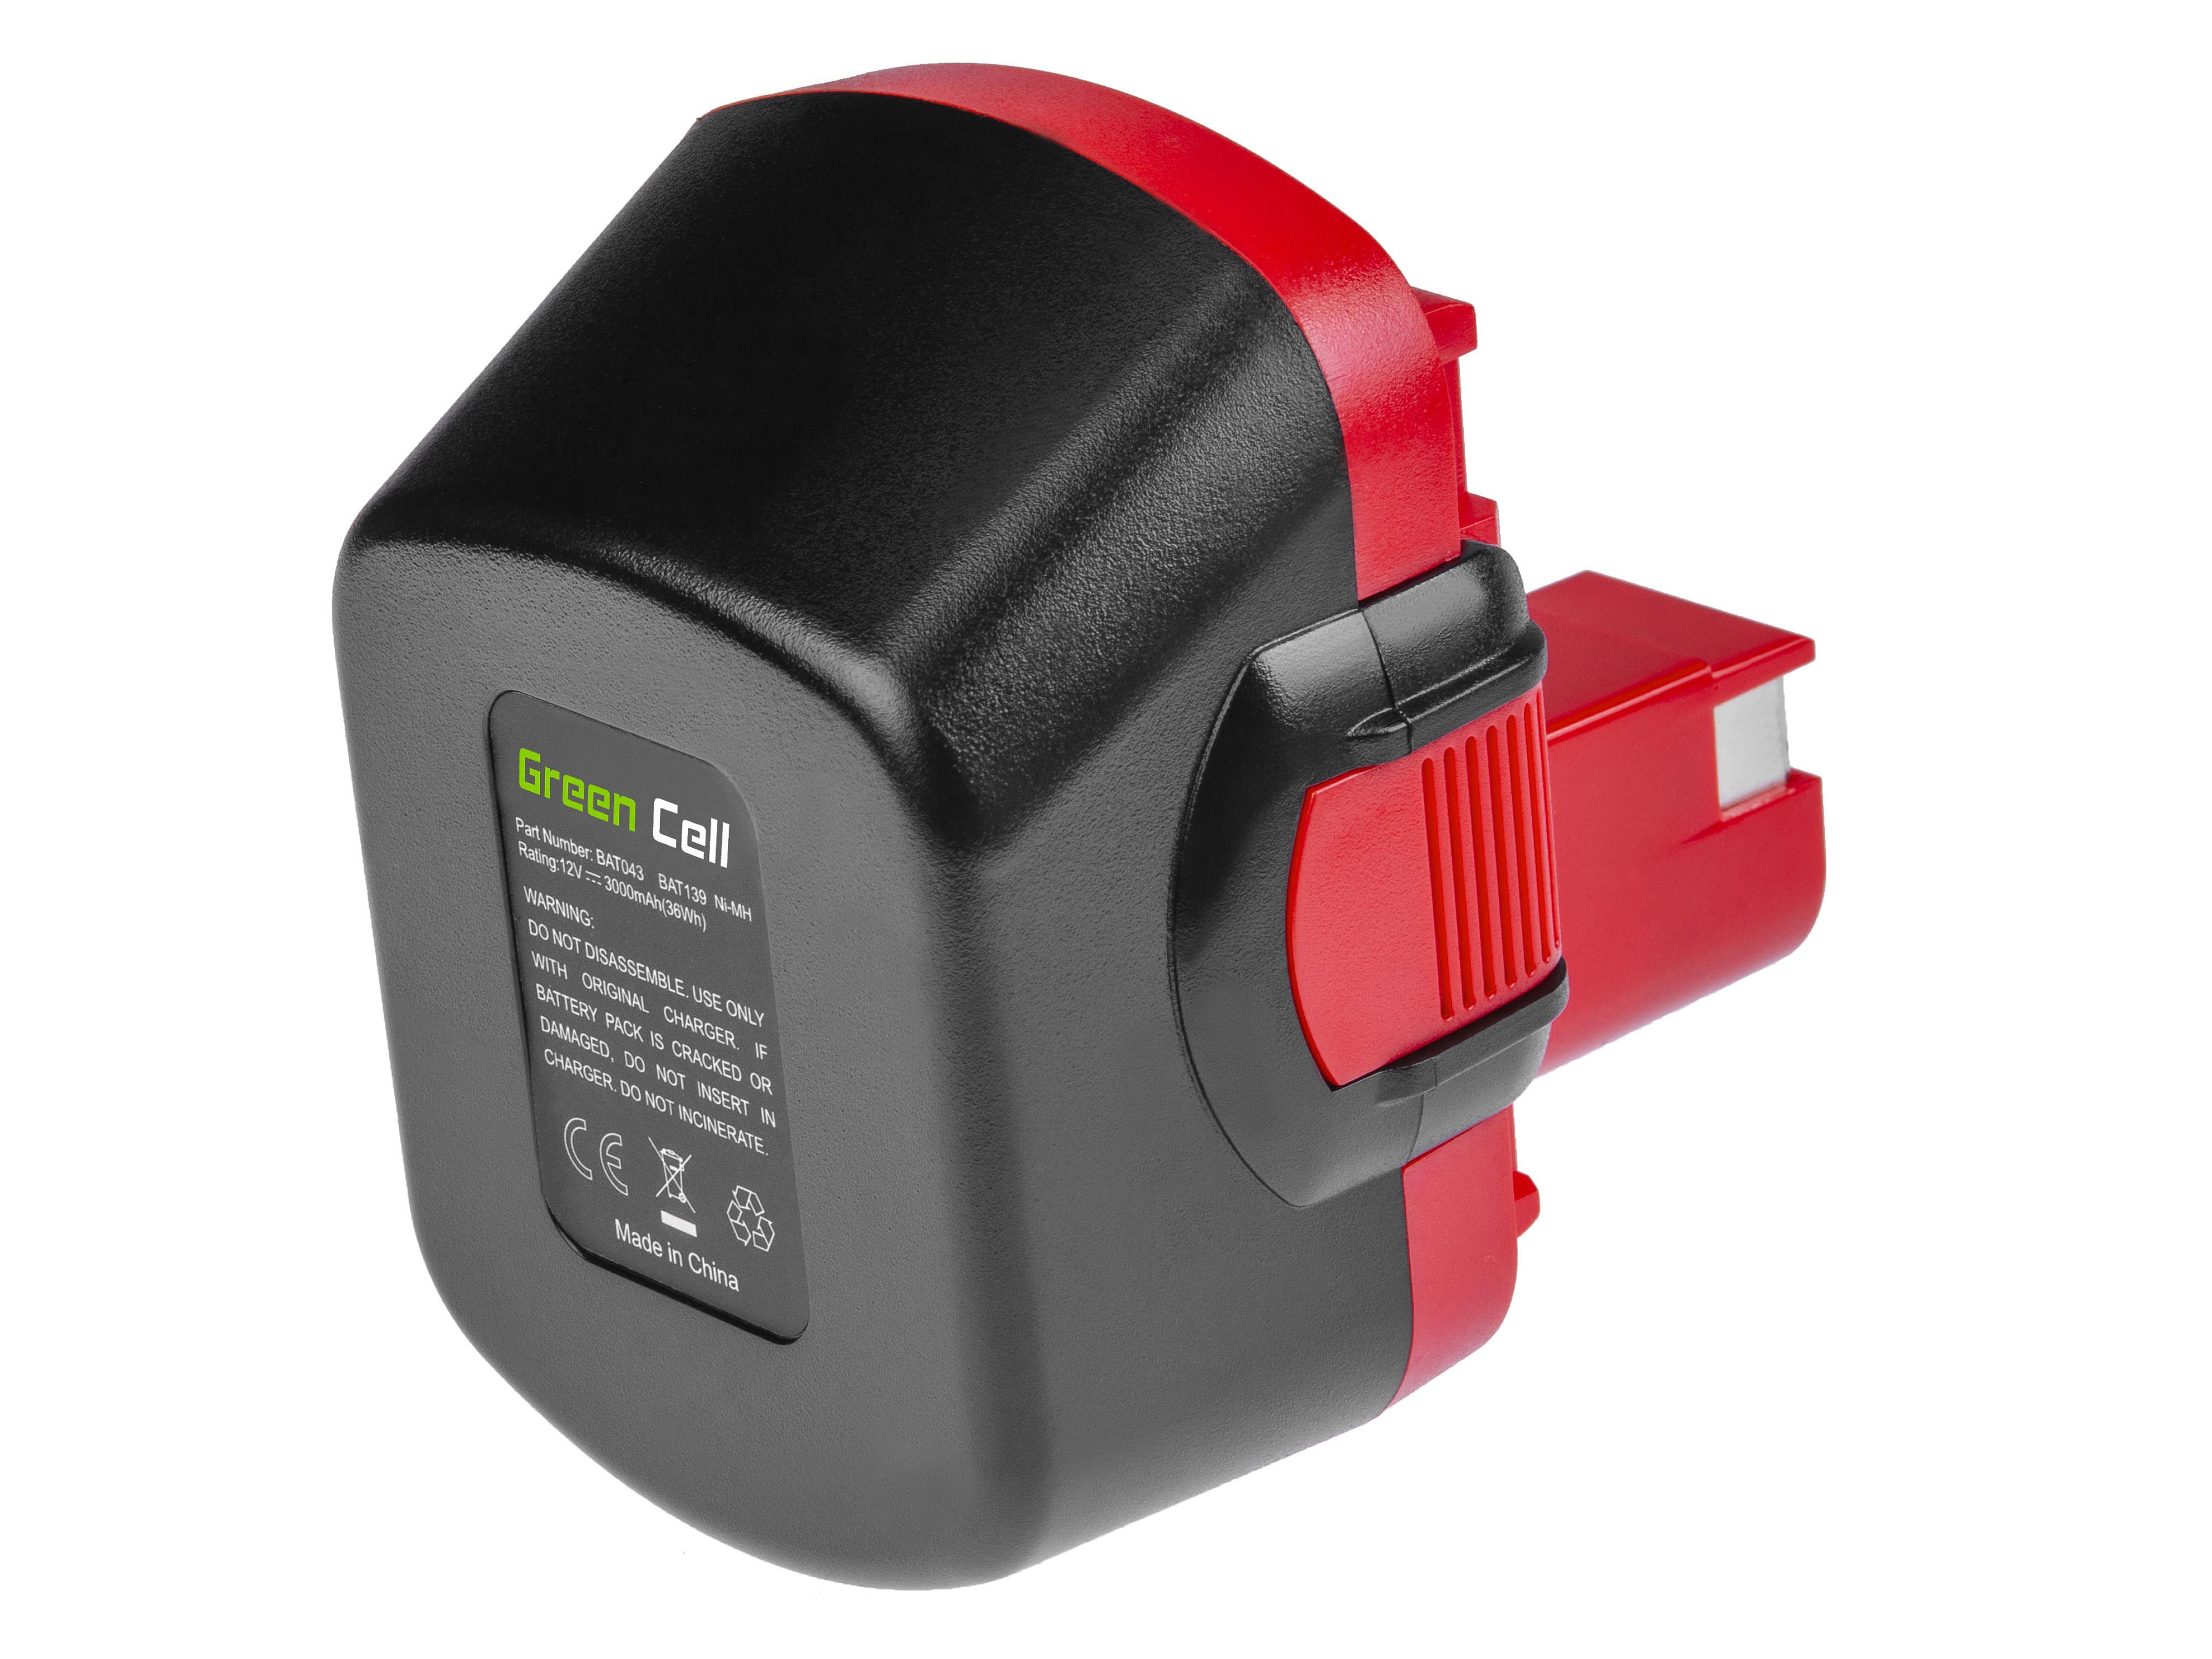 Baterie Green Cell Bosch BAT049 PSR GSR PSB 12 VE-2 12V 3000mAh Ni-MH – neoriginální